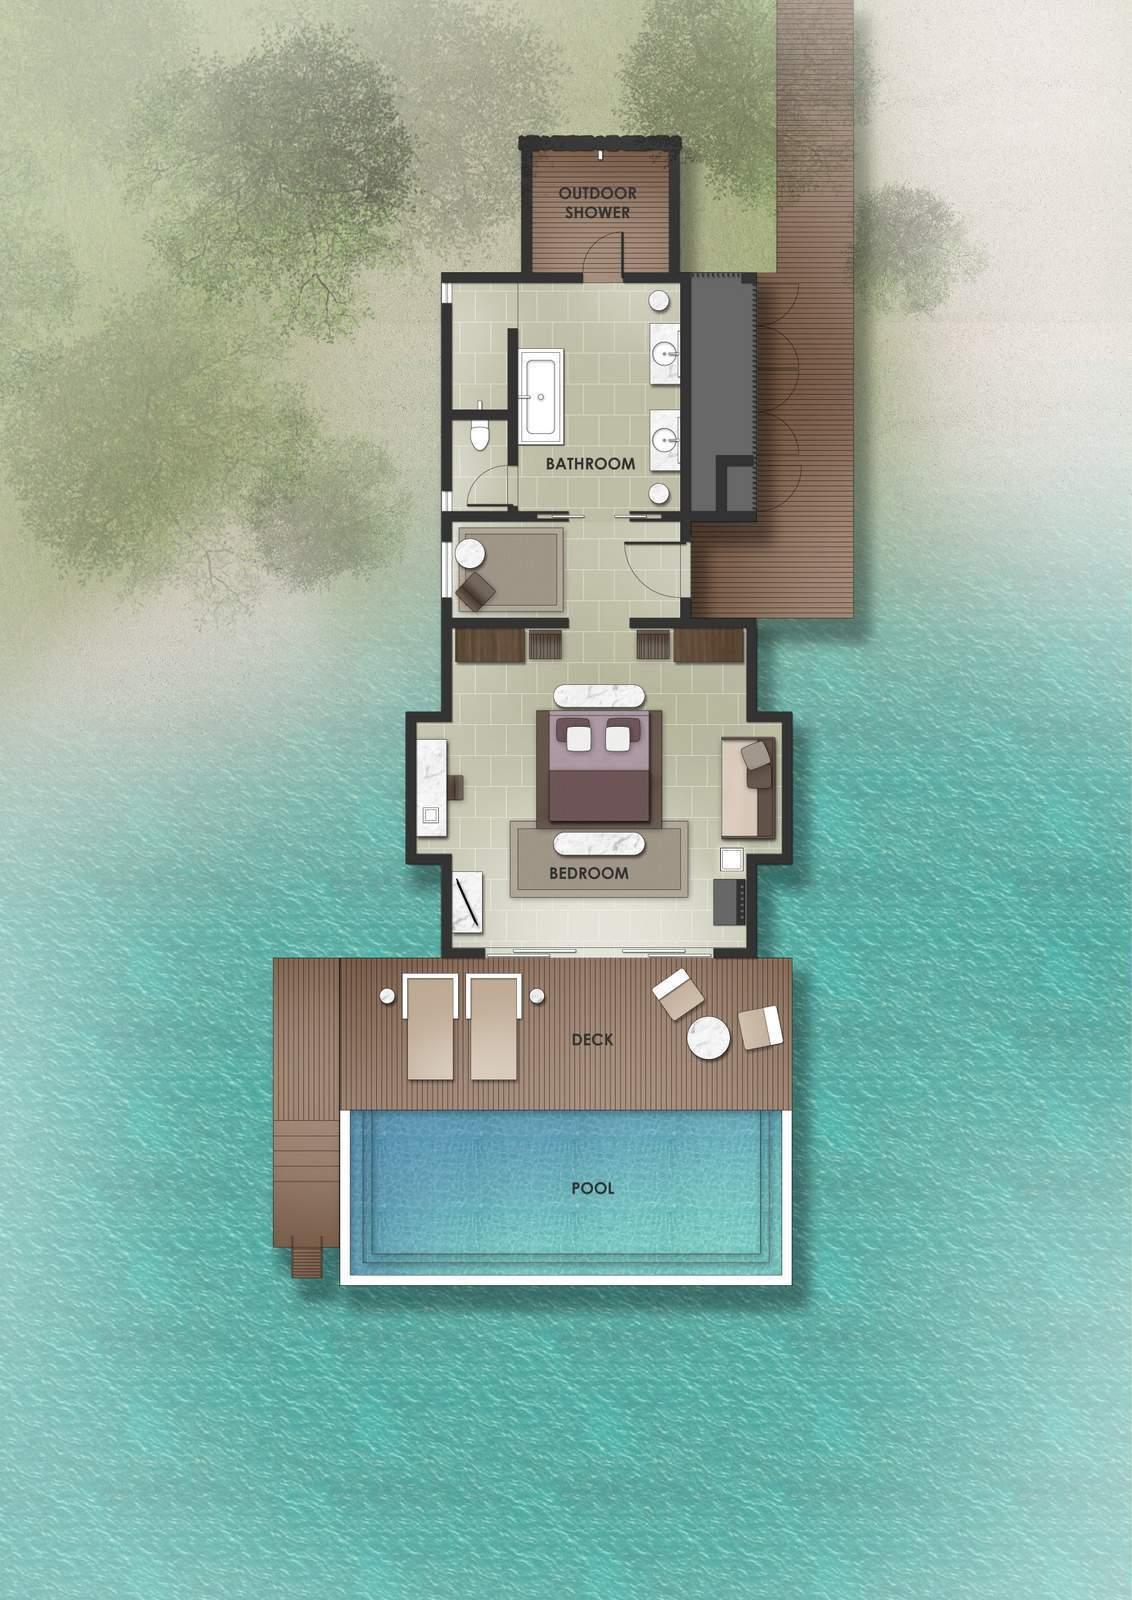 Мальдивы, отель The Residence Maldives at Dhigurah, план-схема номера Lagoon Pool Villa